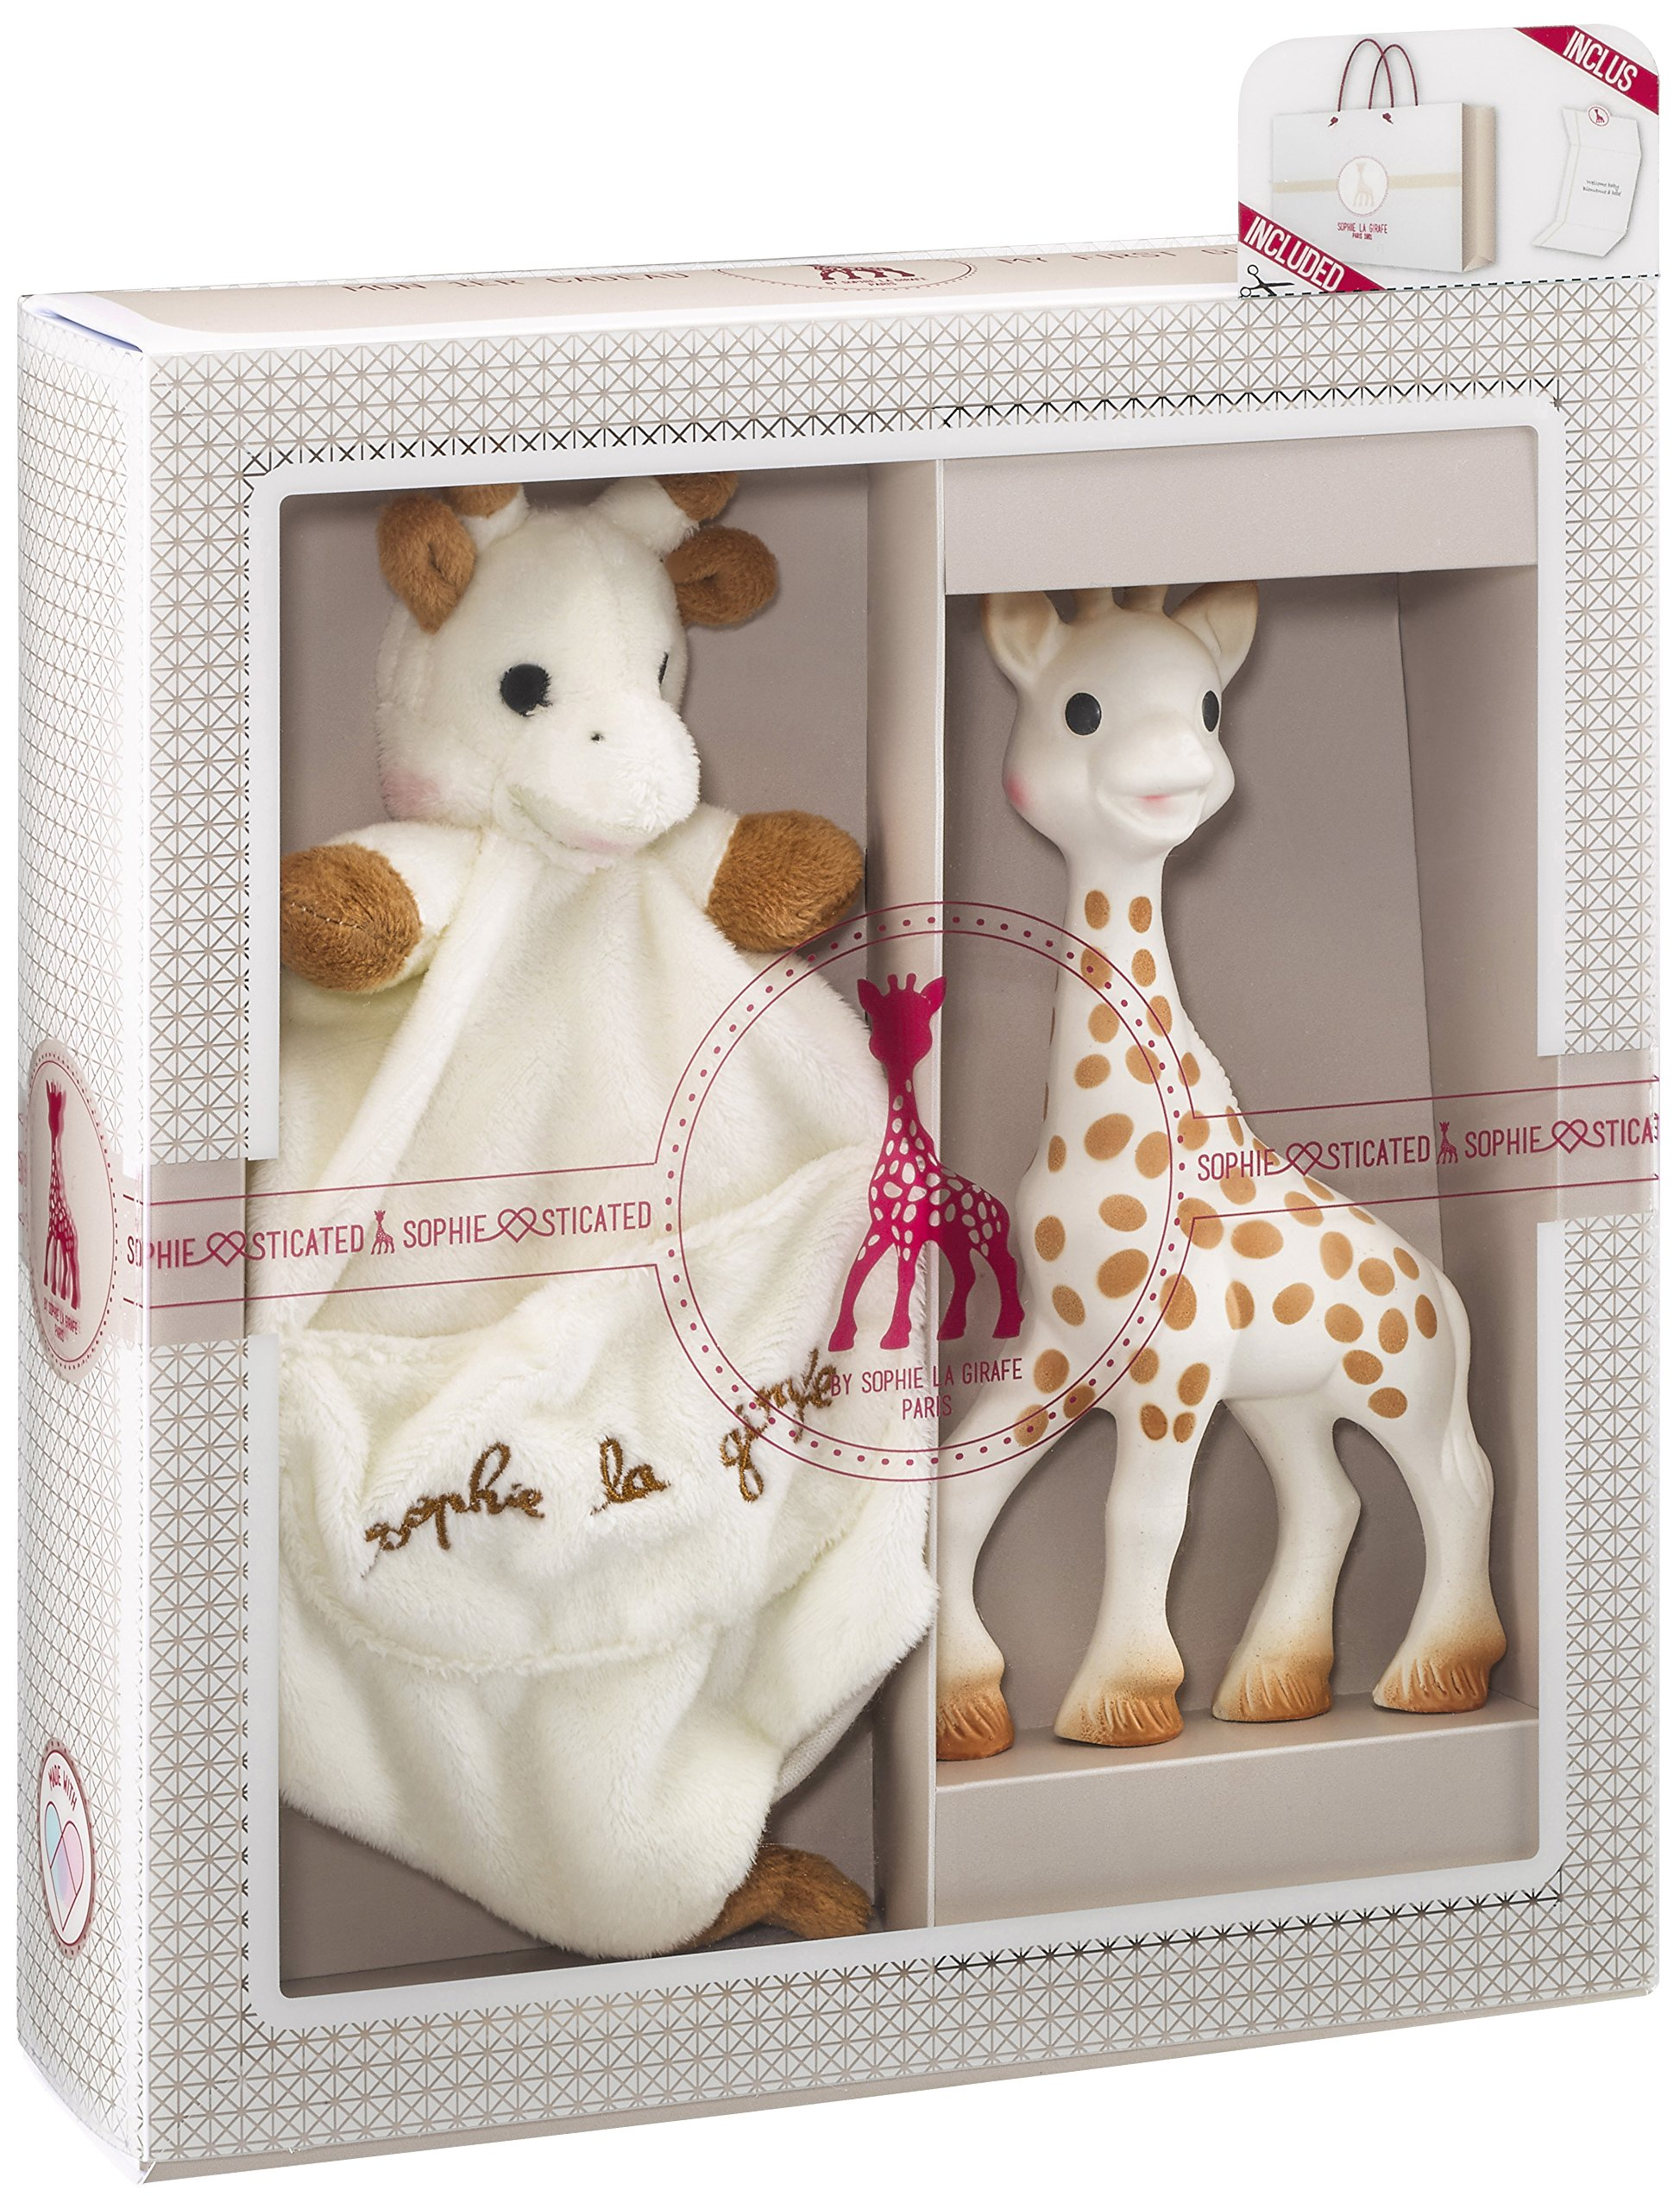 Vulli Sophie la Girafe Sophiesticated Tenderness Creation Birth Set Medium #1- Plush Lovie & Toy